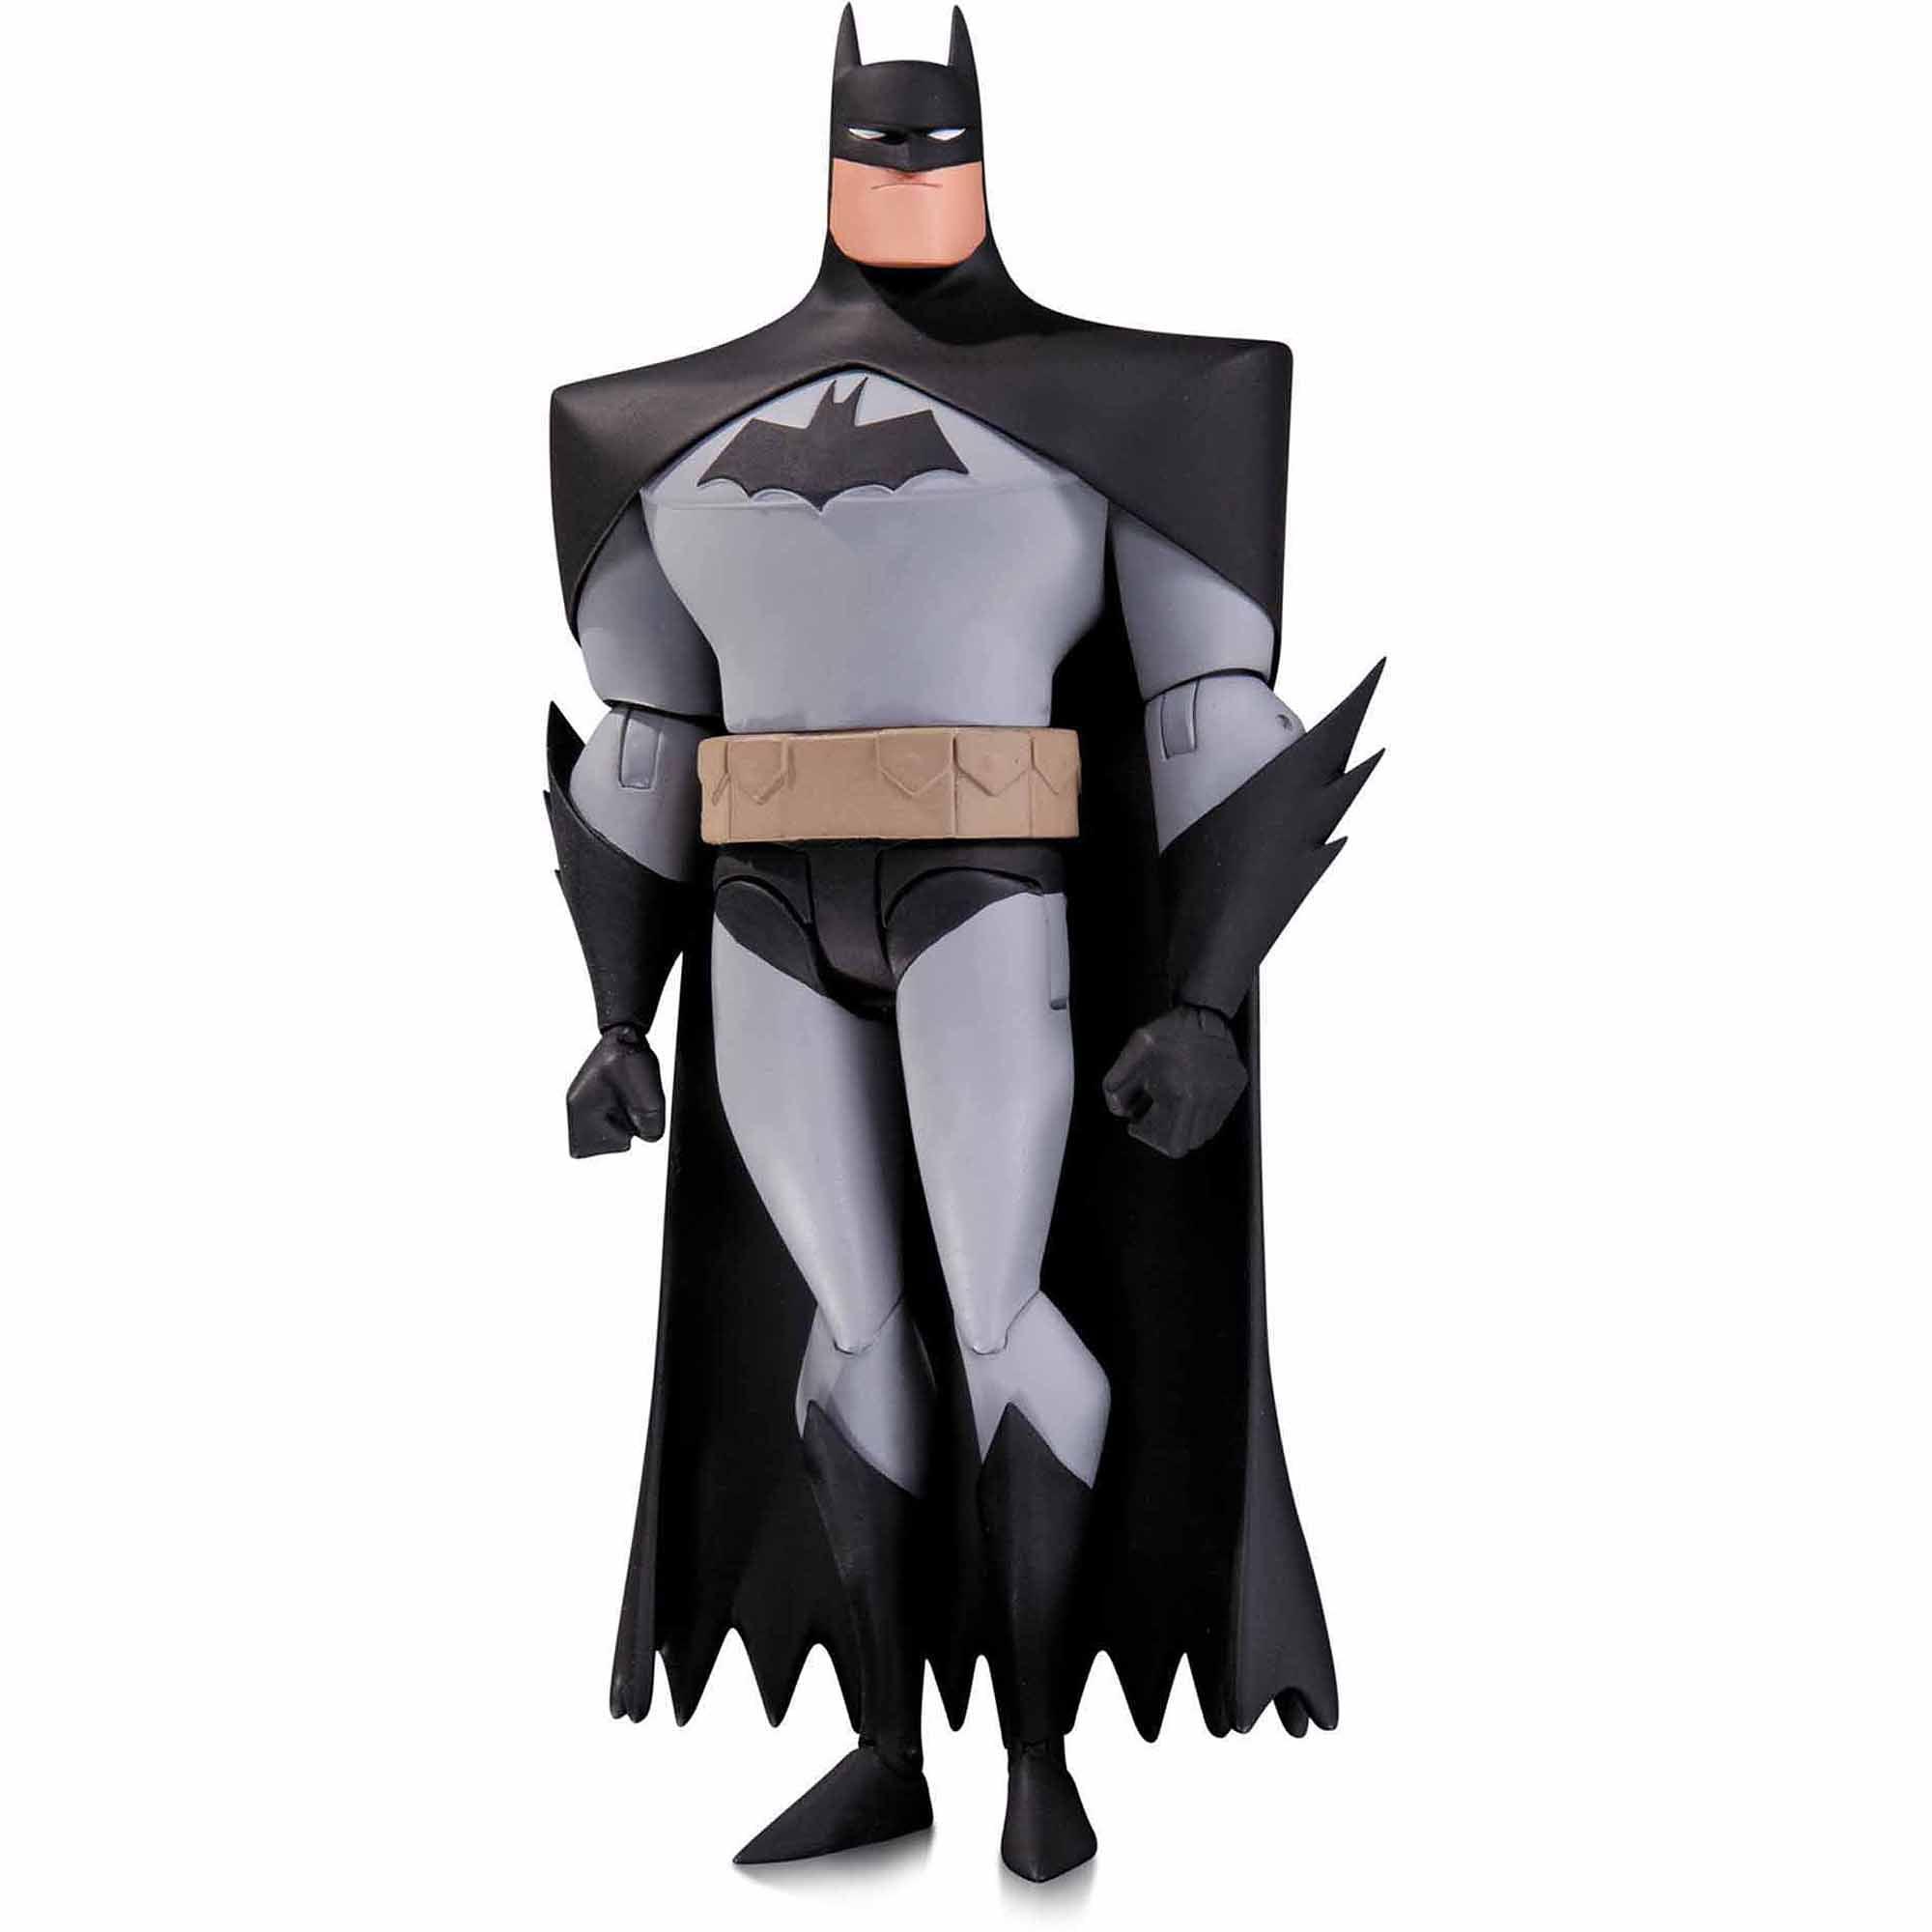 DC Comics Batman Animated Series New Batman Adventures Batman Action Figure